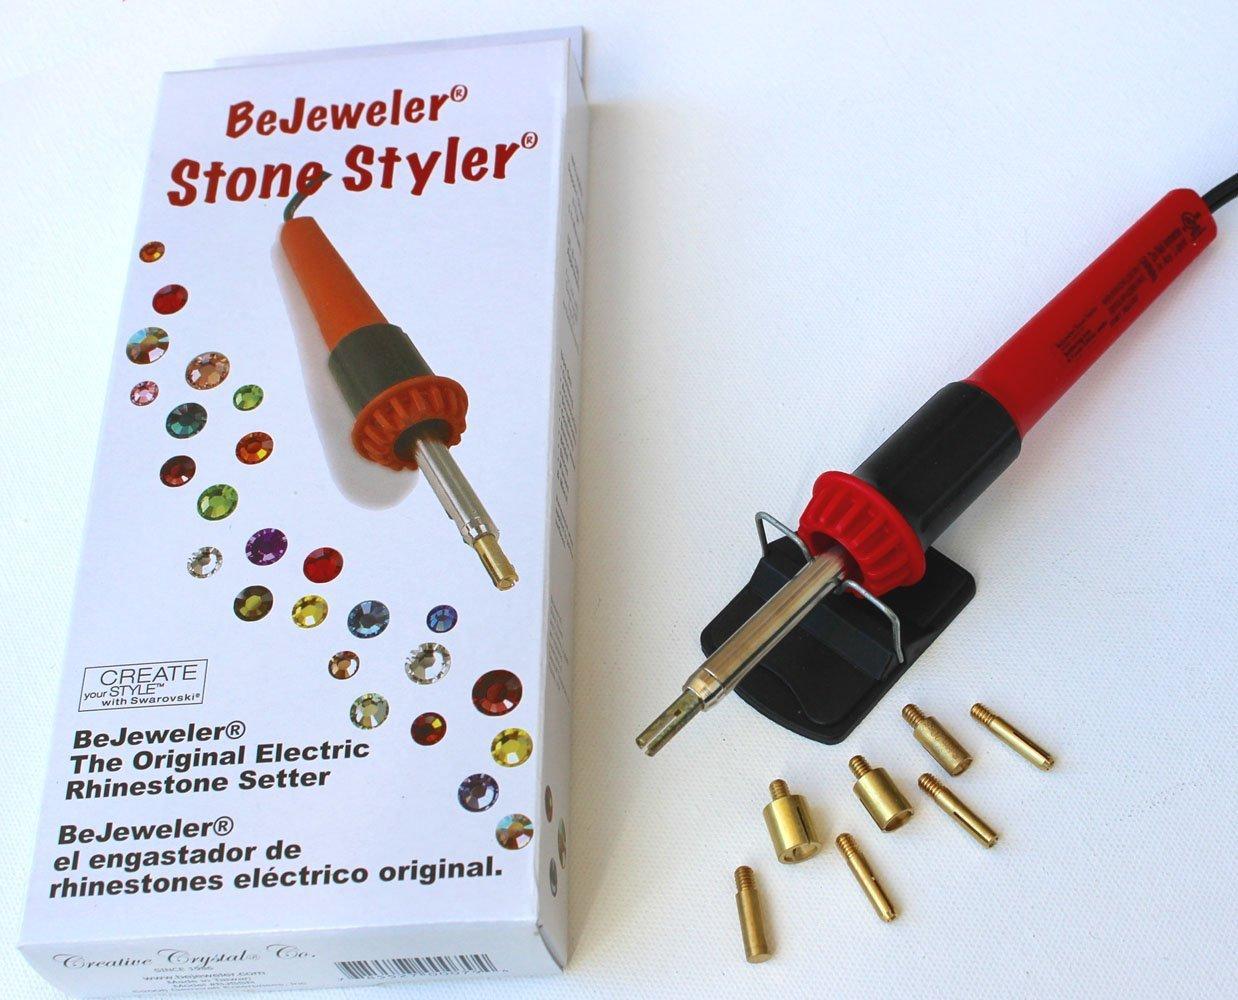 BeJeweler BJSSR Stone Styler hot fix tool Red